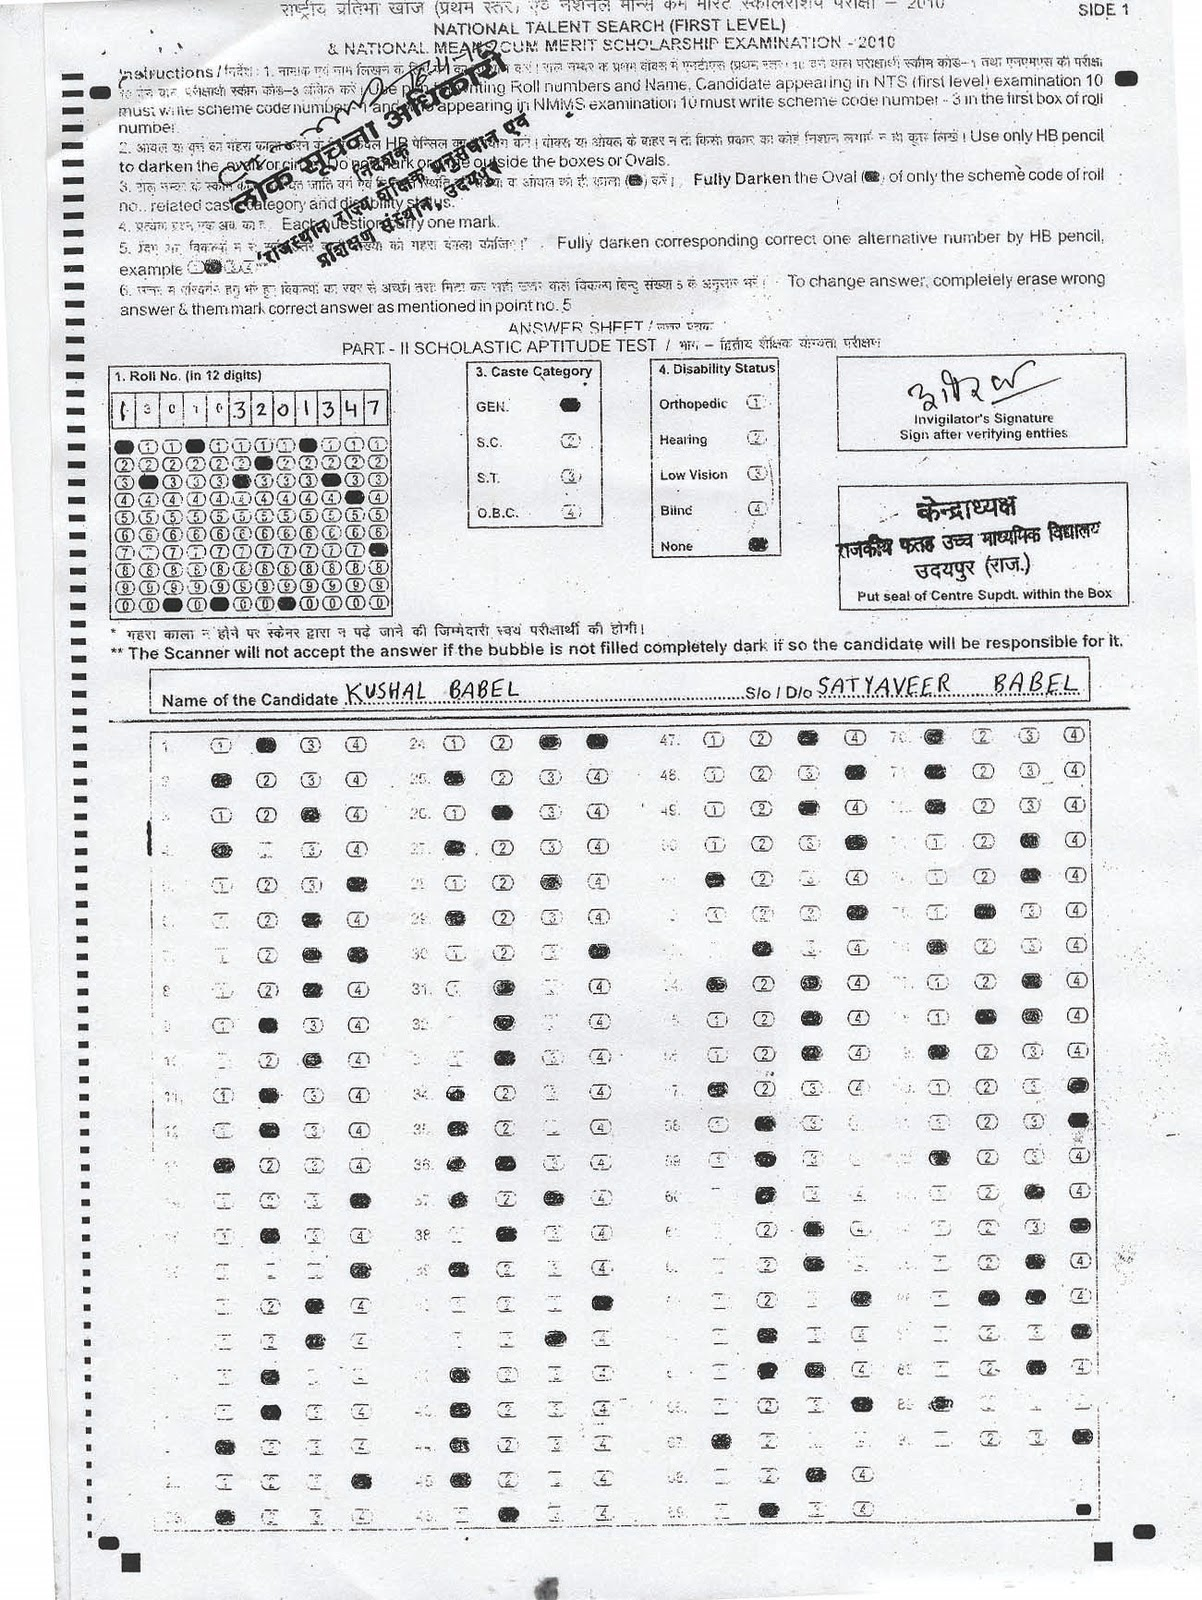 Printable 100 Bubble Answer Sheet